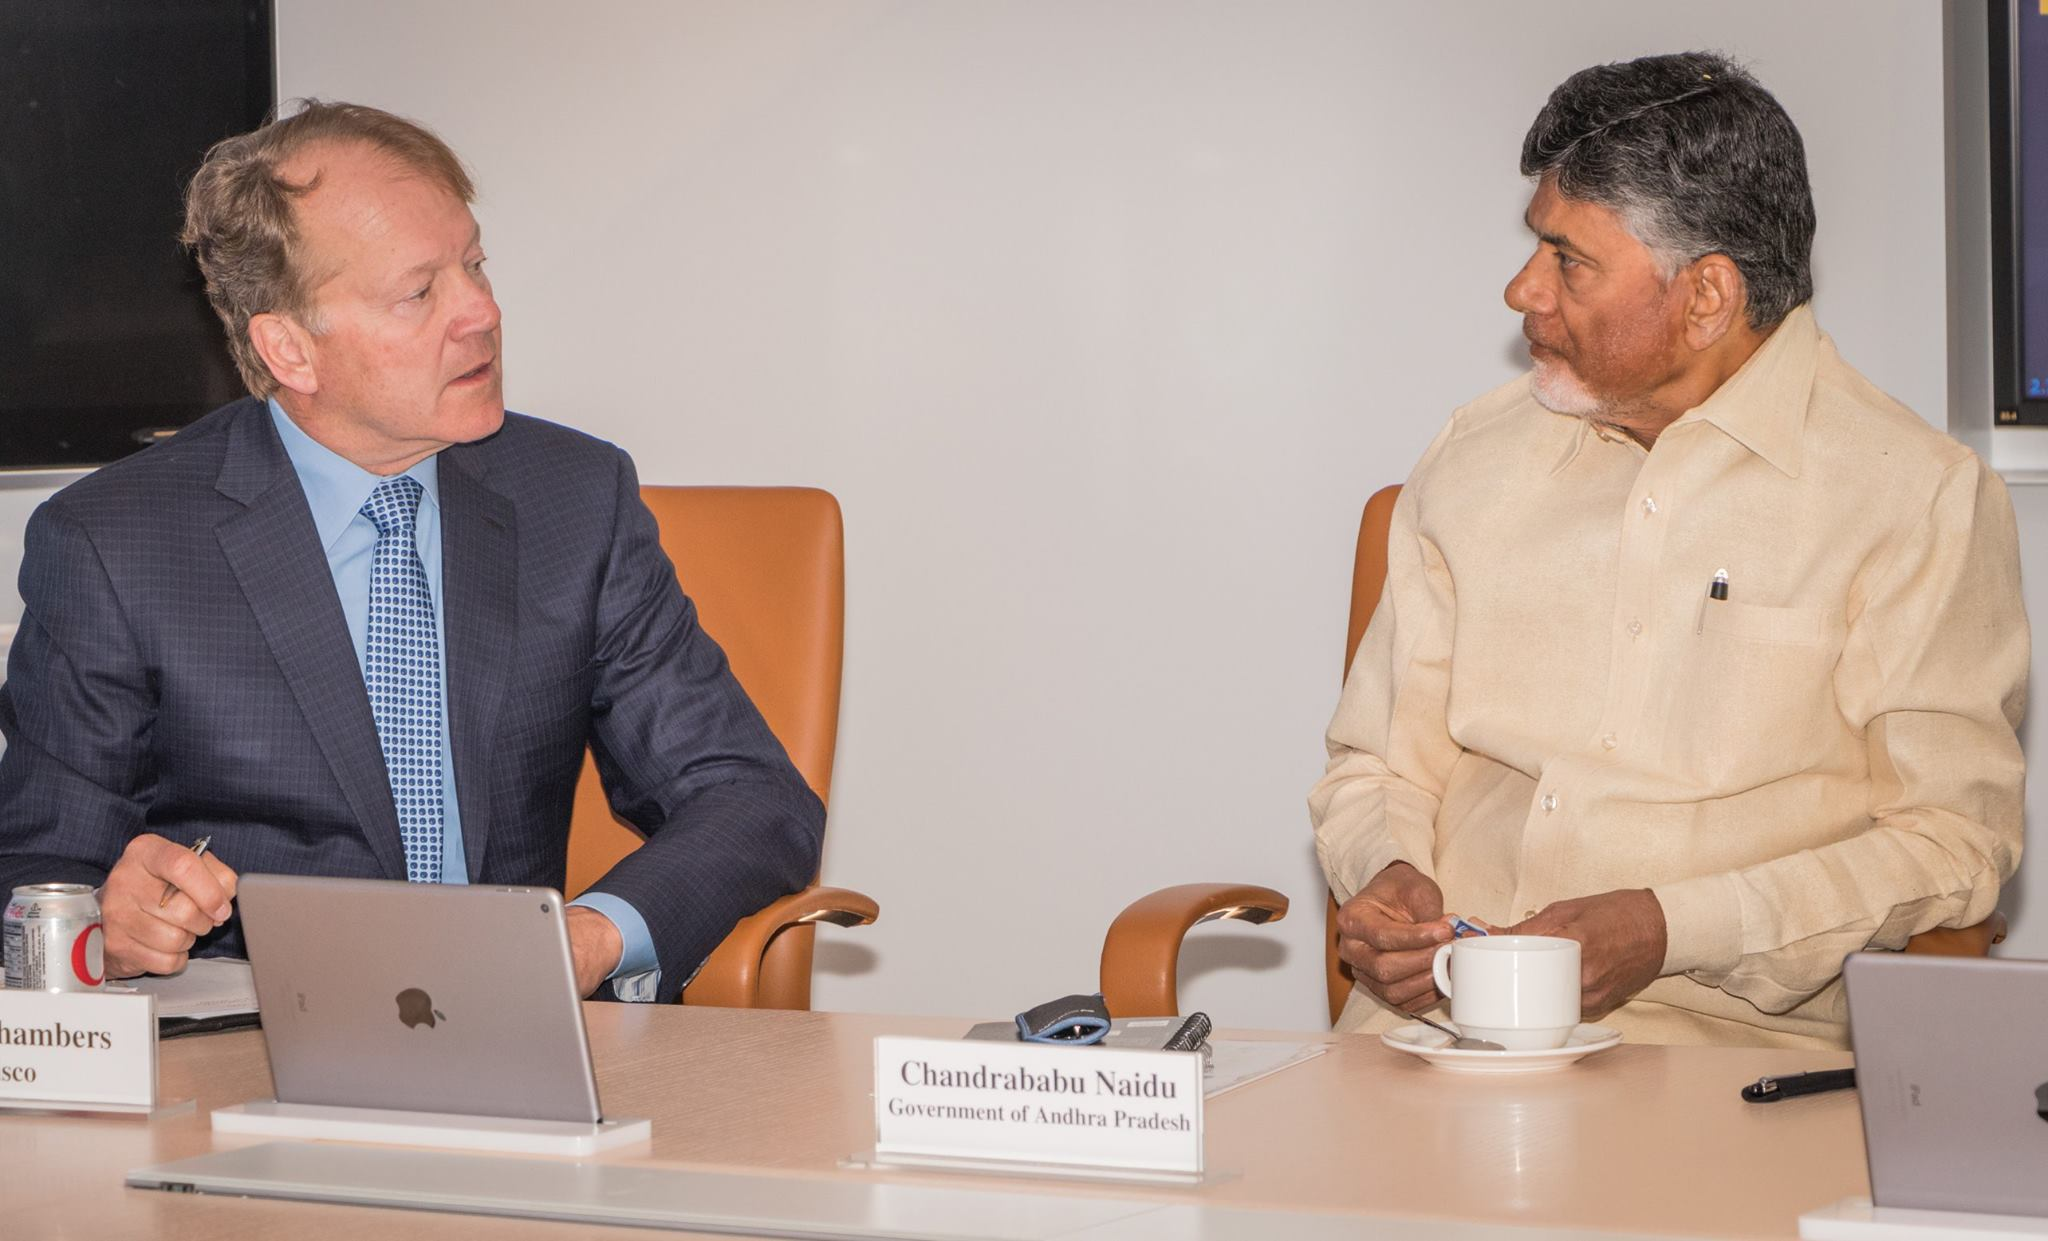 Cisco System chairman John Chambers and Andhra Pradesh chief minister N Chandrababu Naidu at Cisco headquarters.